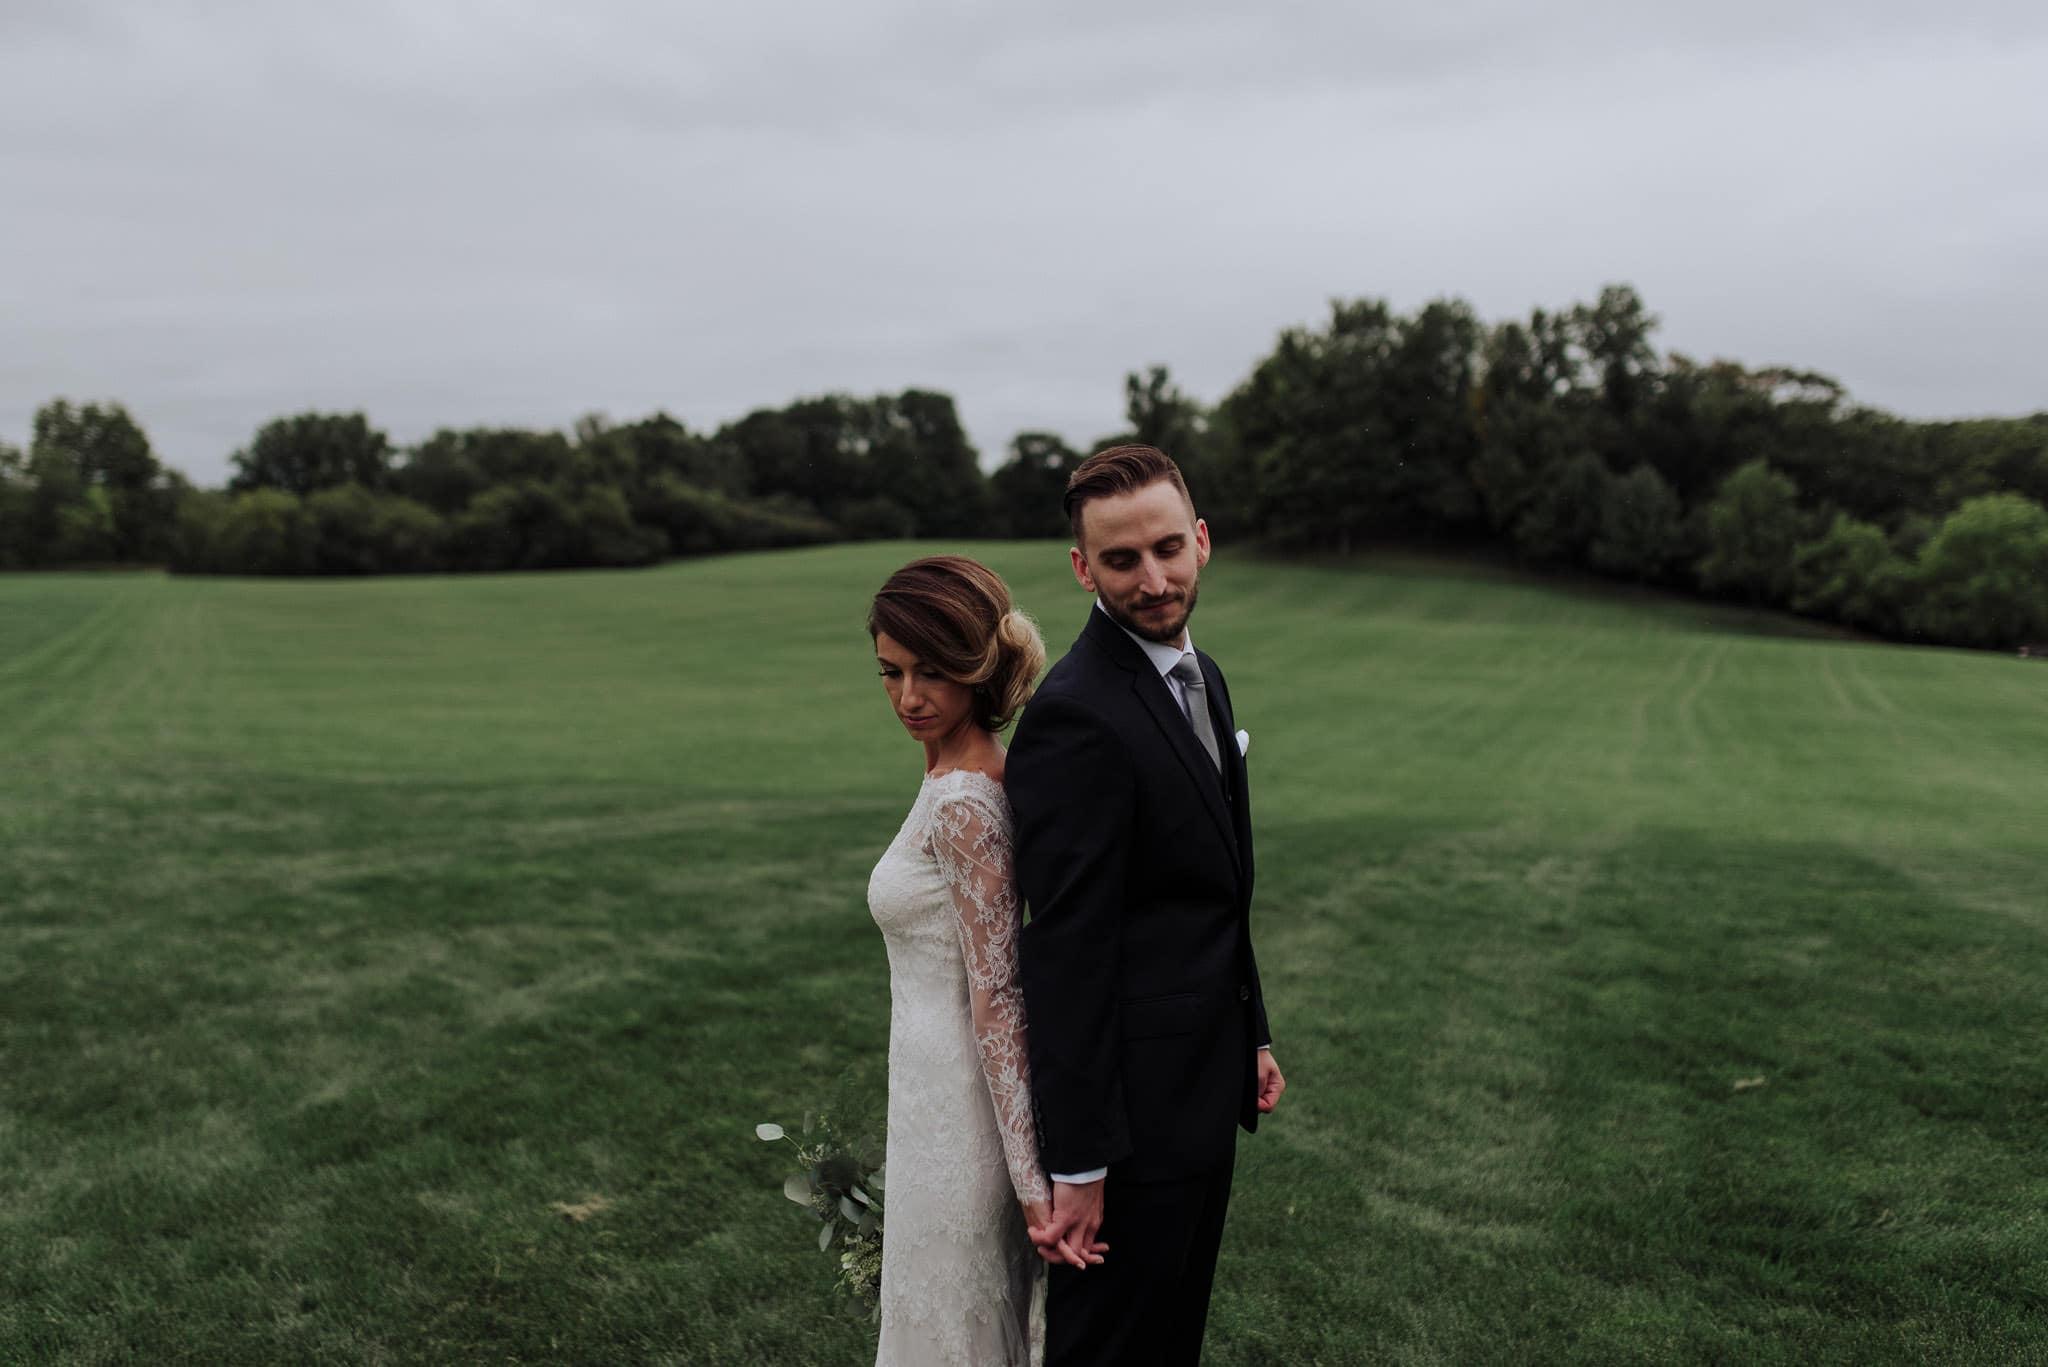 hayloft-on-the-arch-wedding-31